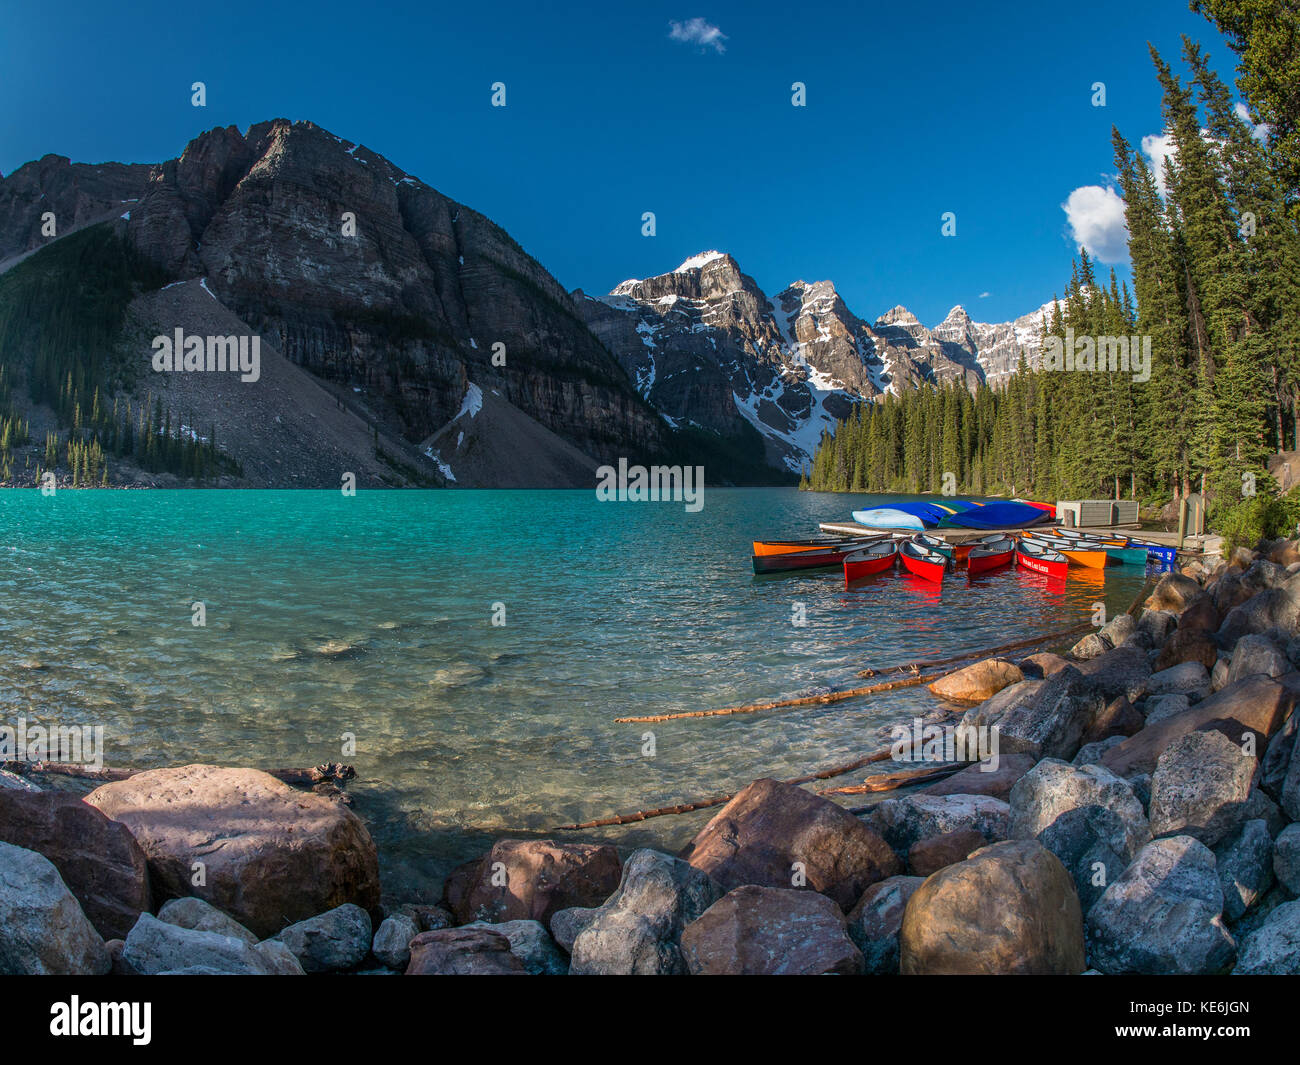 Moraine Lake, Banff Nationalpark, Alberta, Kanada. Stockbild